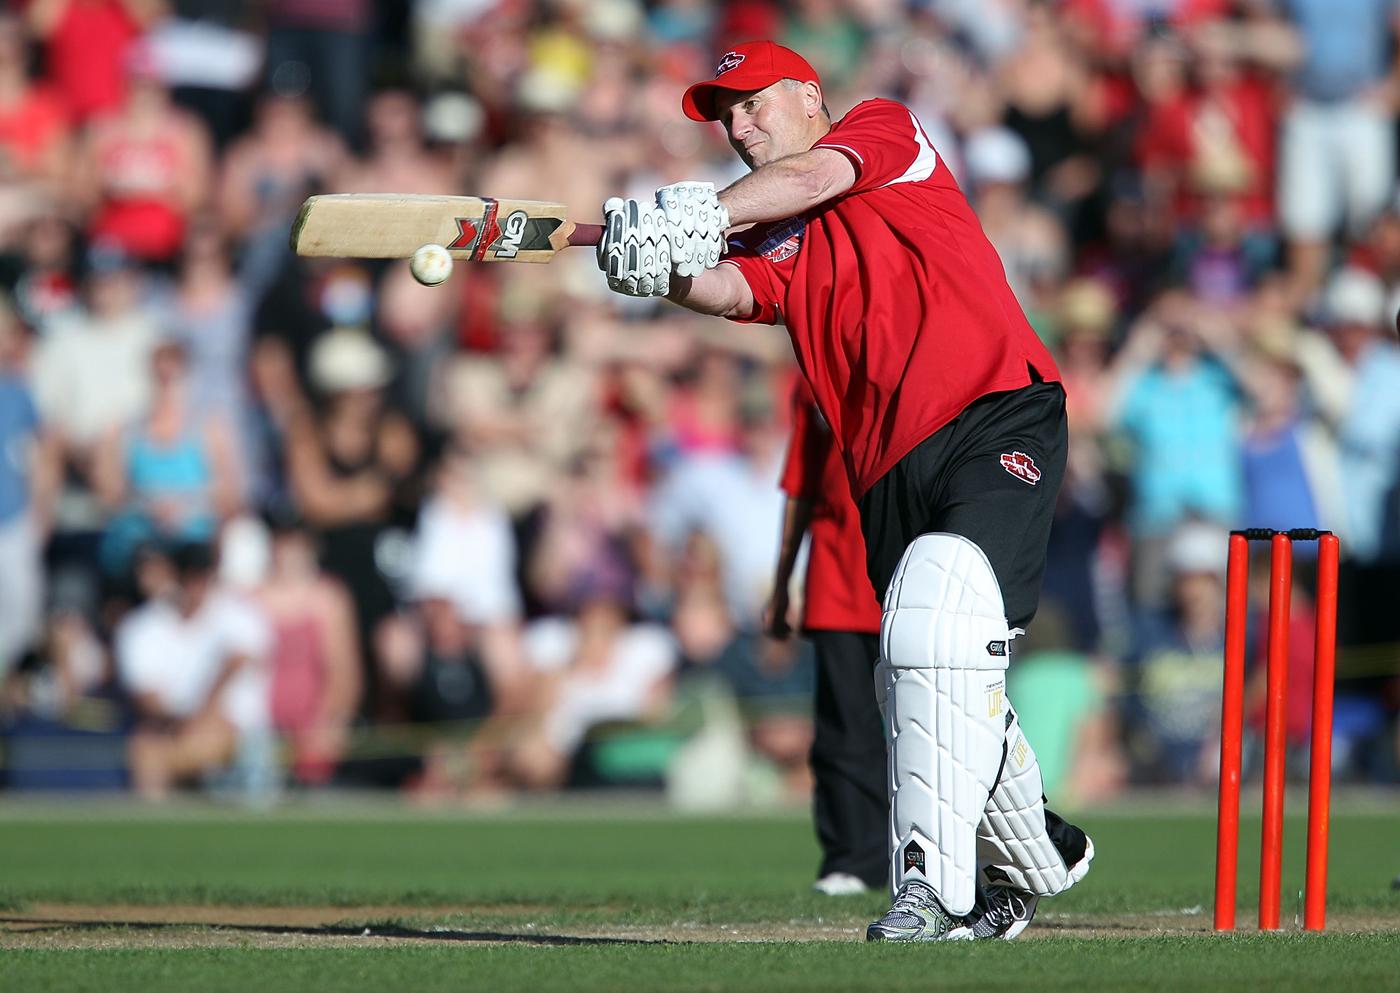 New Zealand prime minister John Key bats